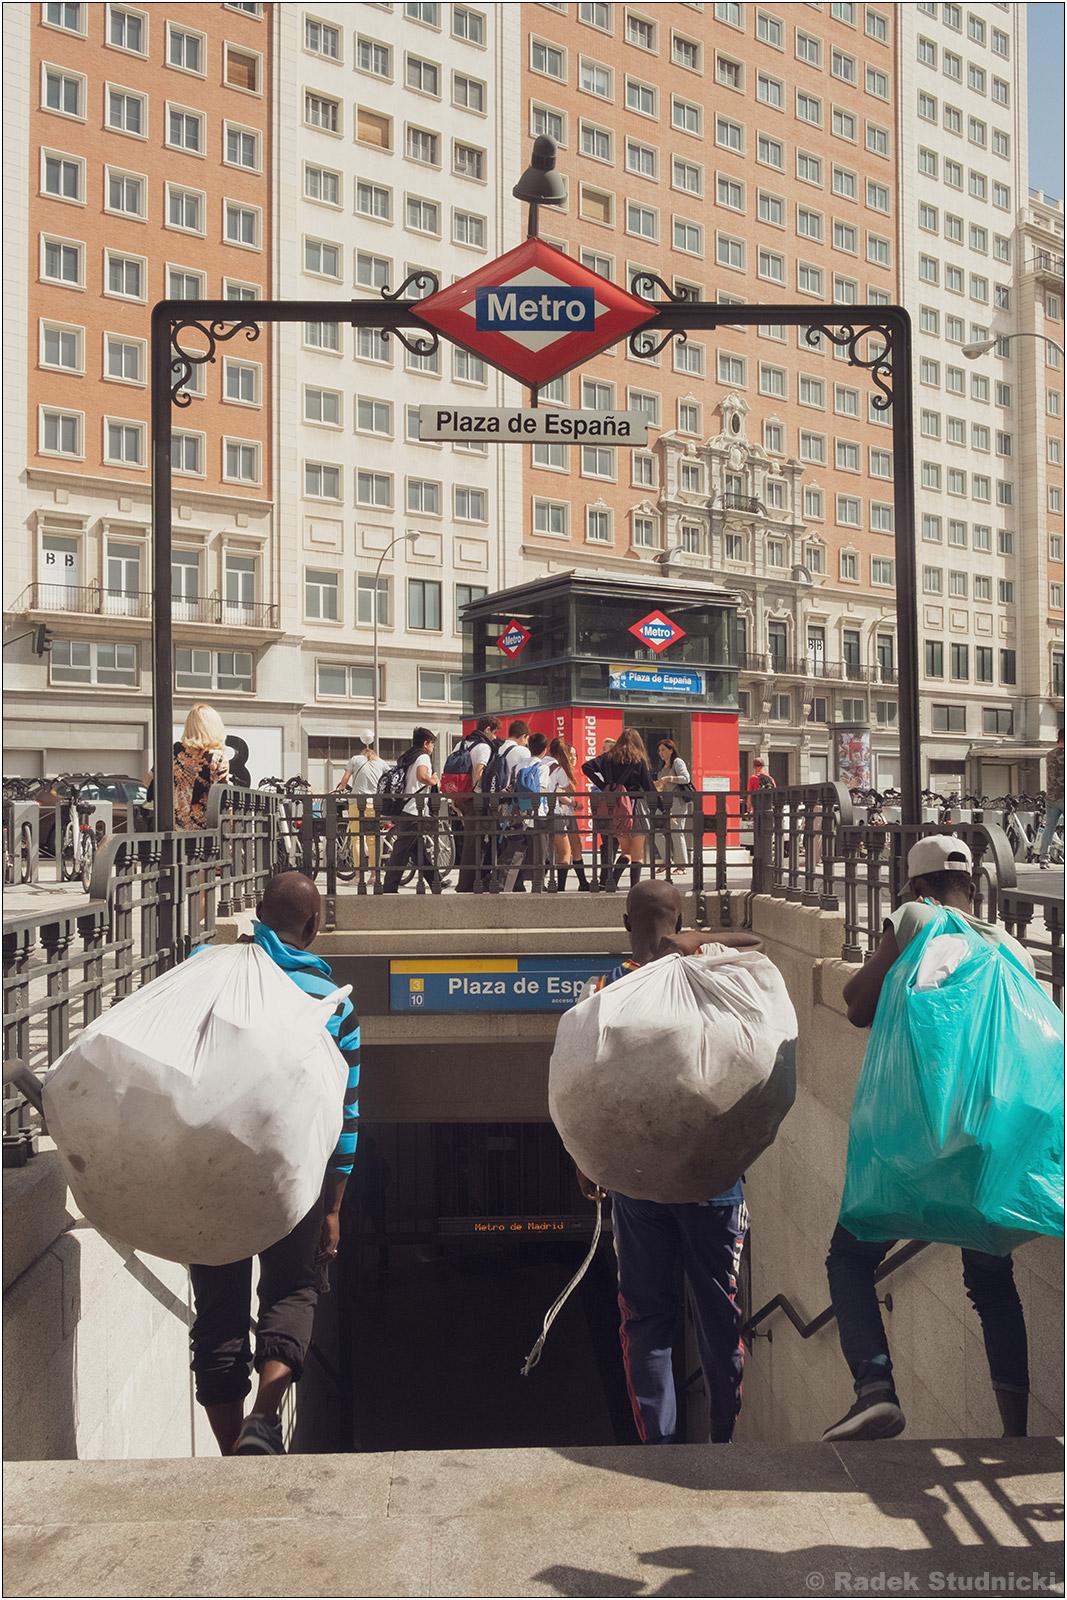 Ucieczka do metra